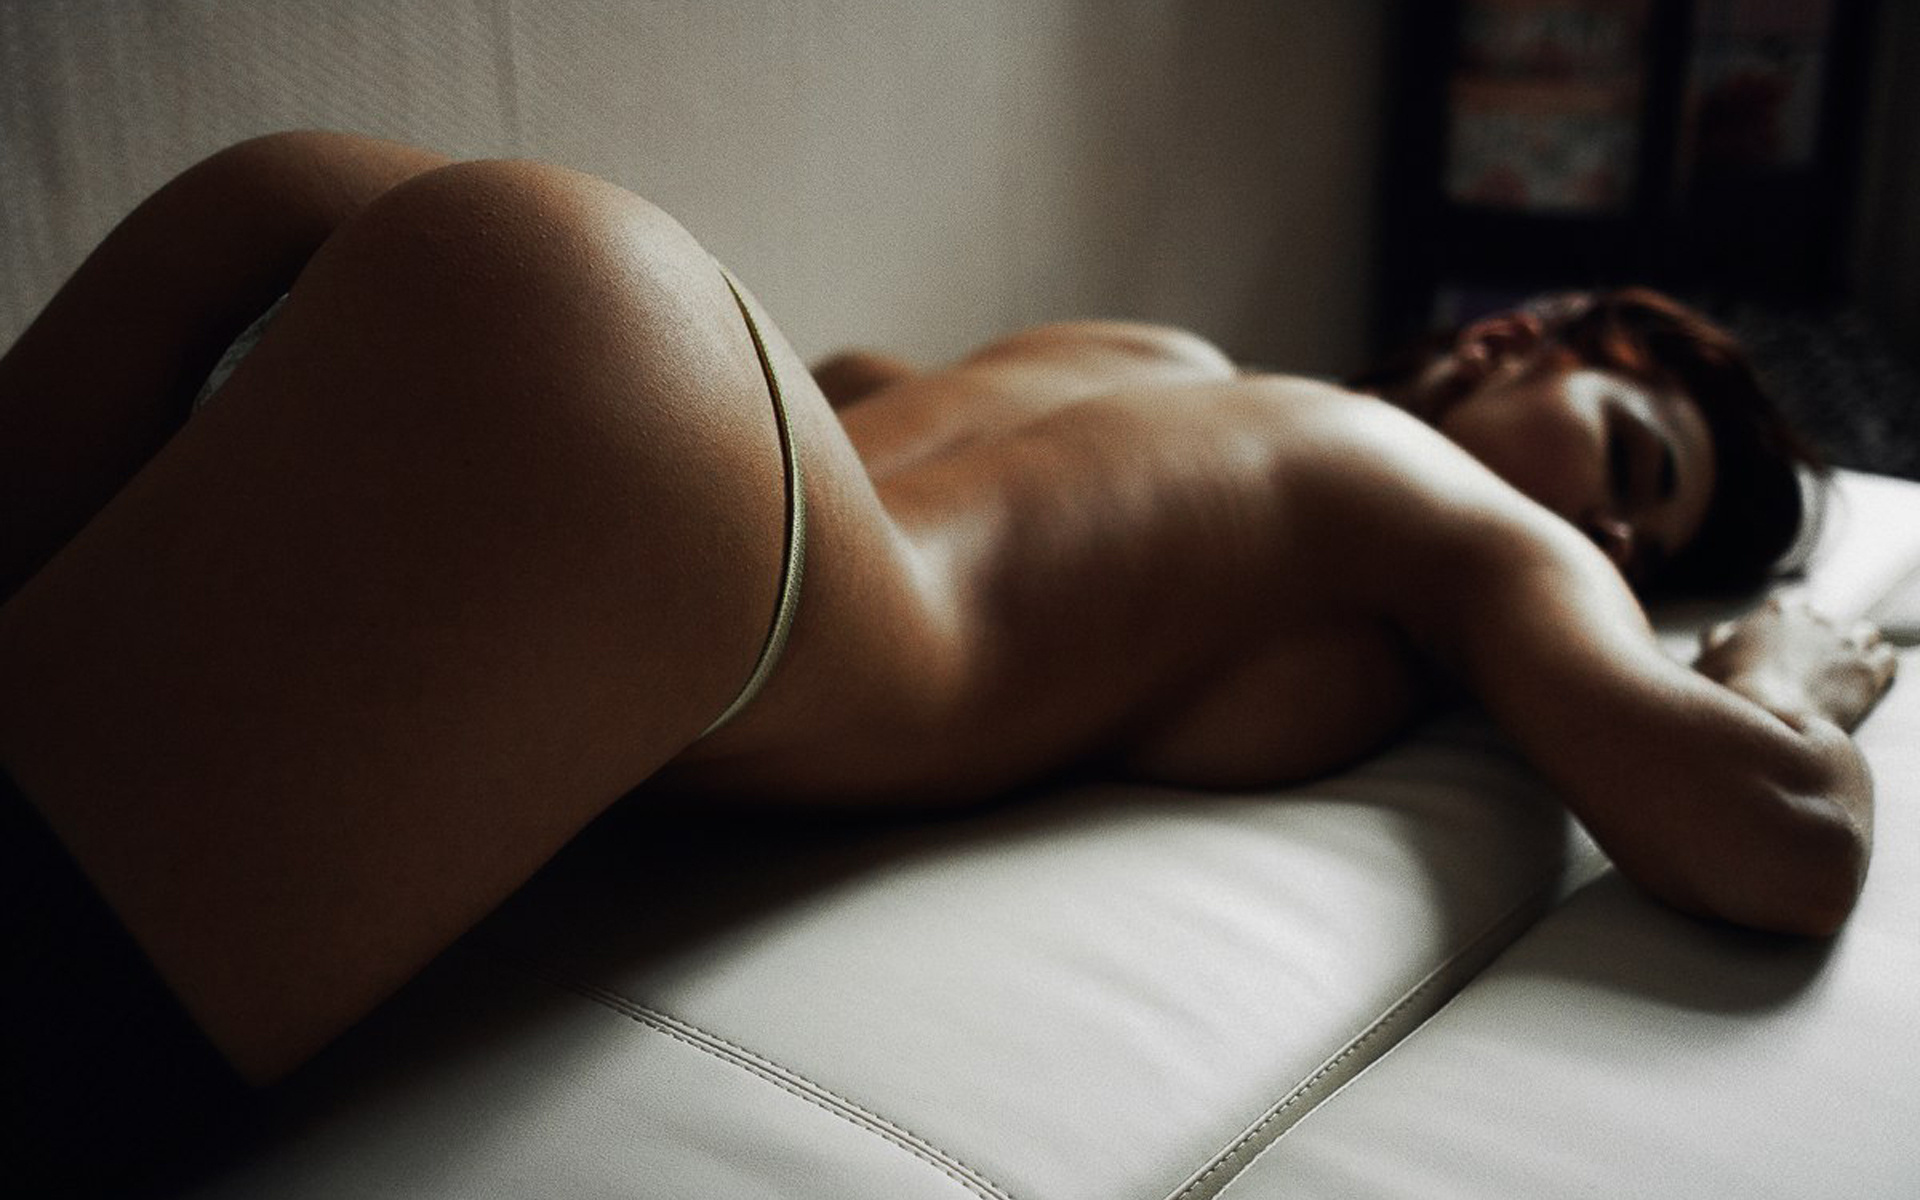 Фото секси попка 28 фотография